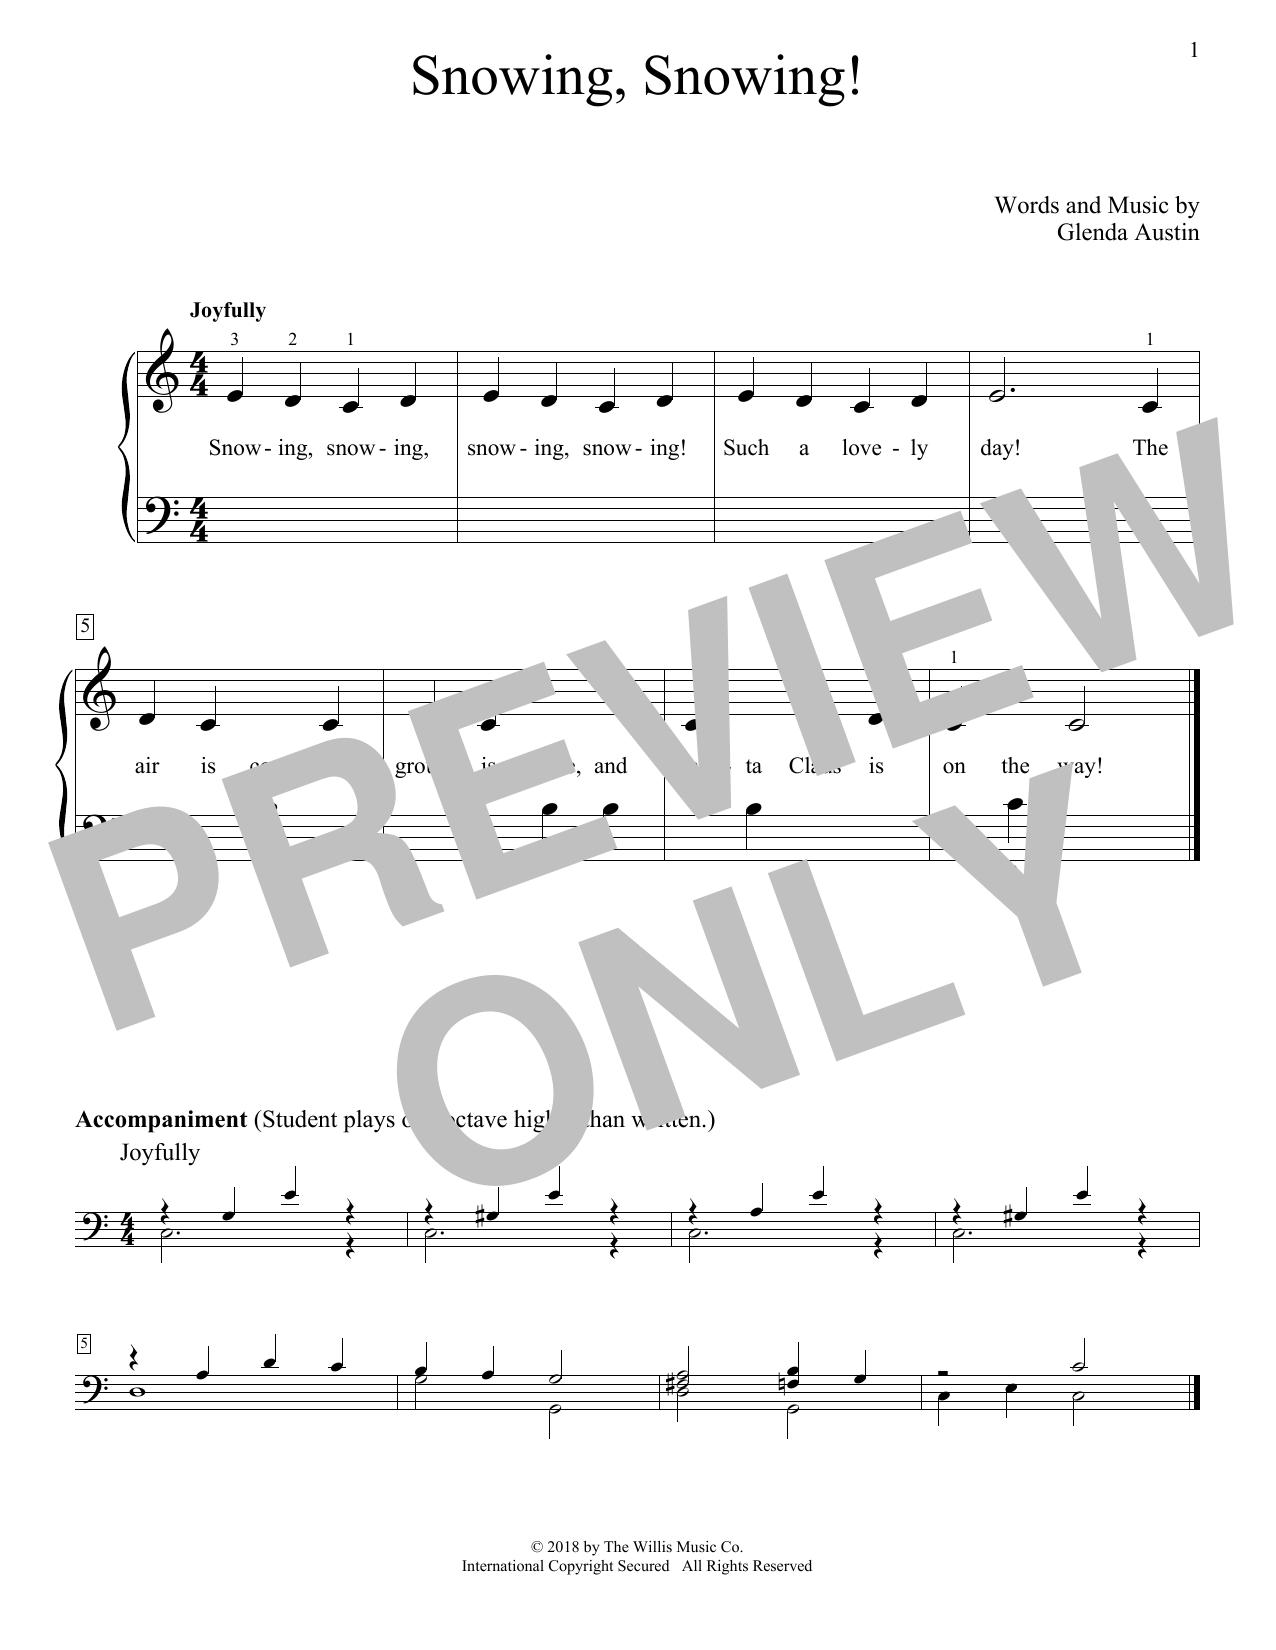 Glenda Austin Snowing, Snowing! sheet music notes and chords. Download Printable PDF.